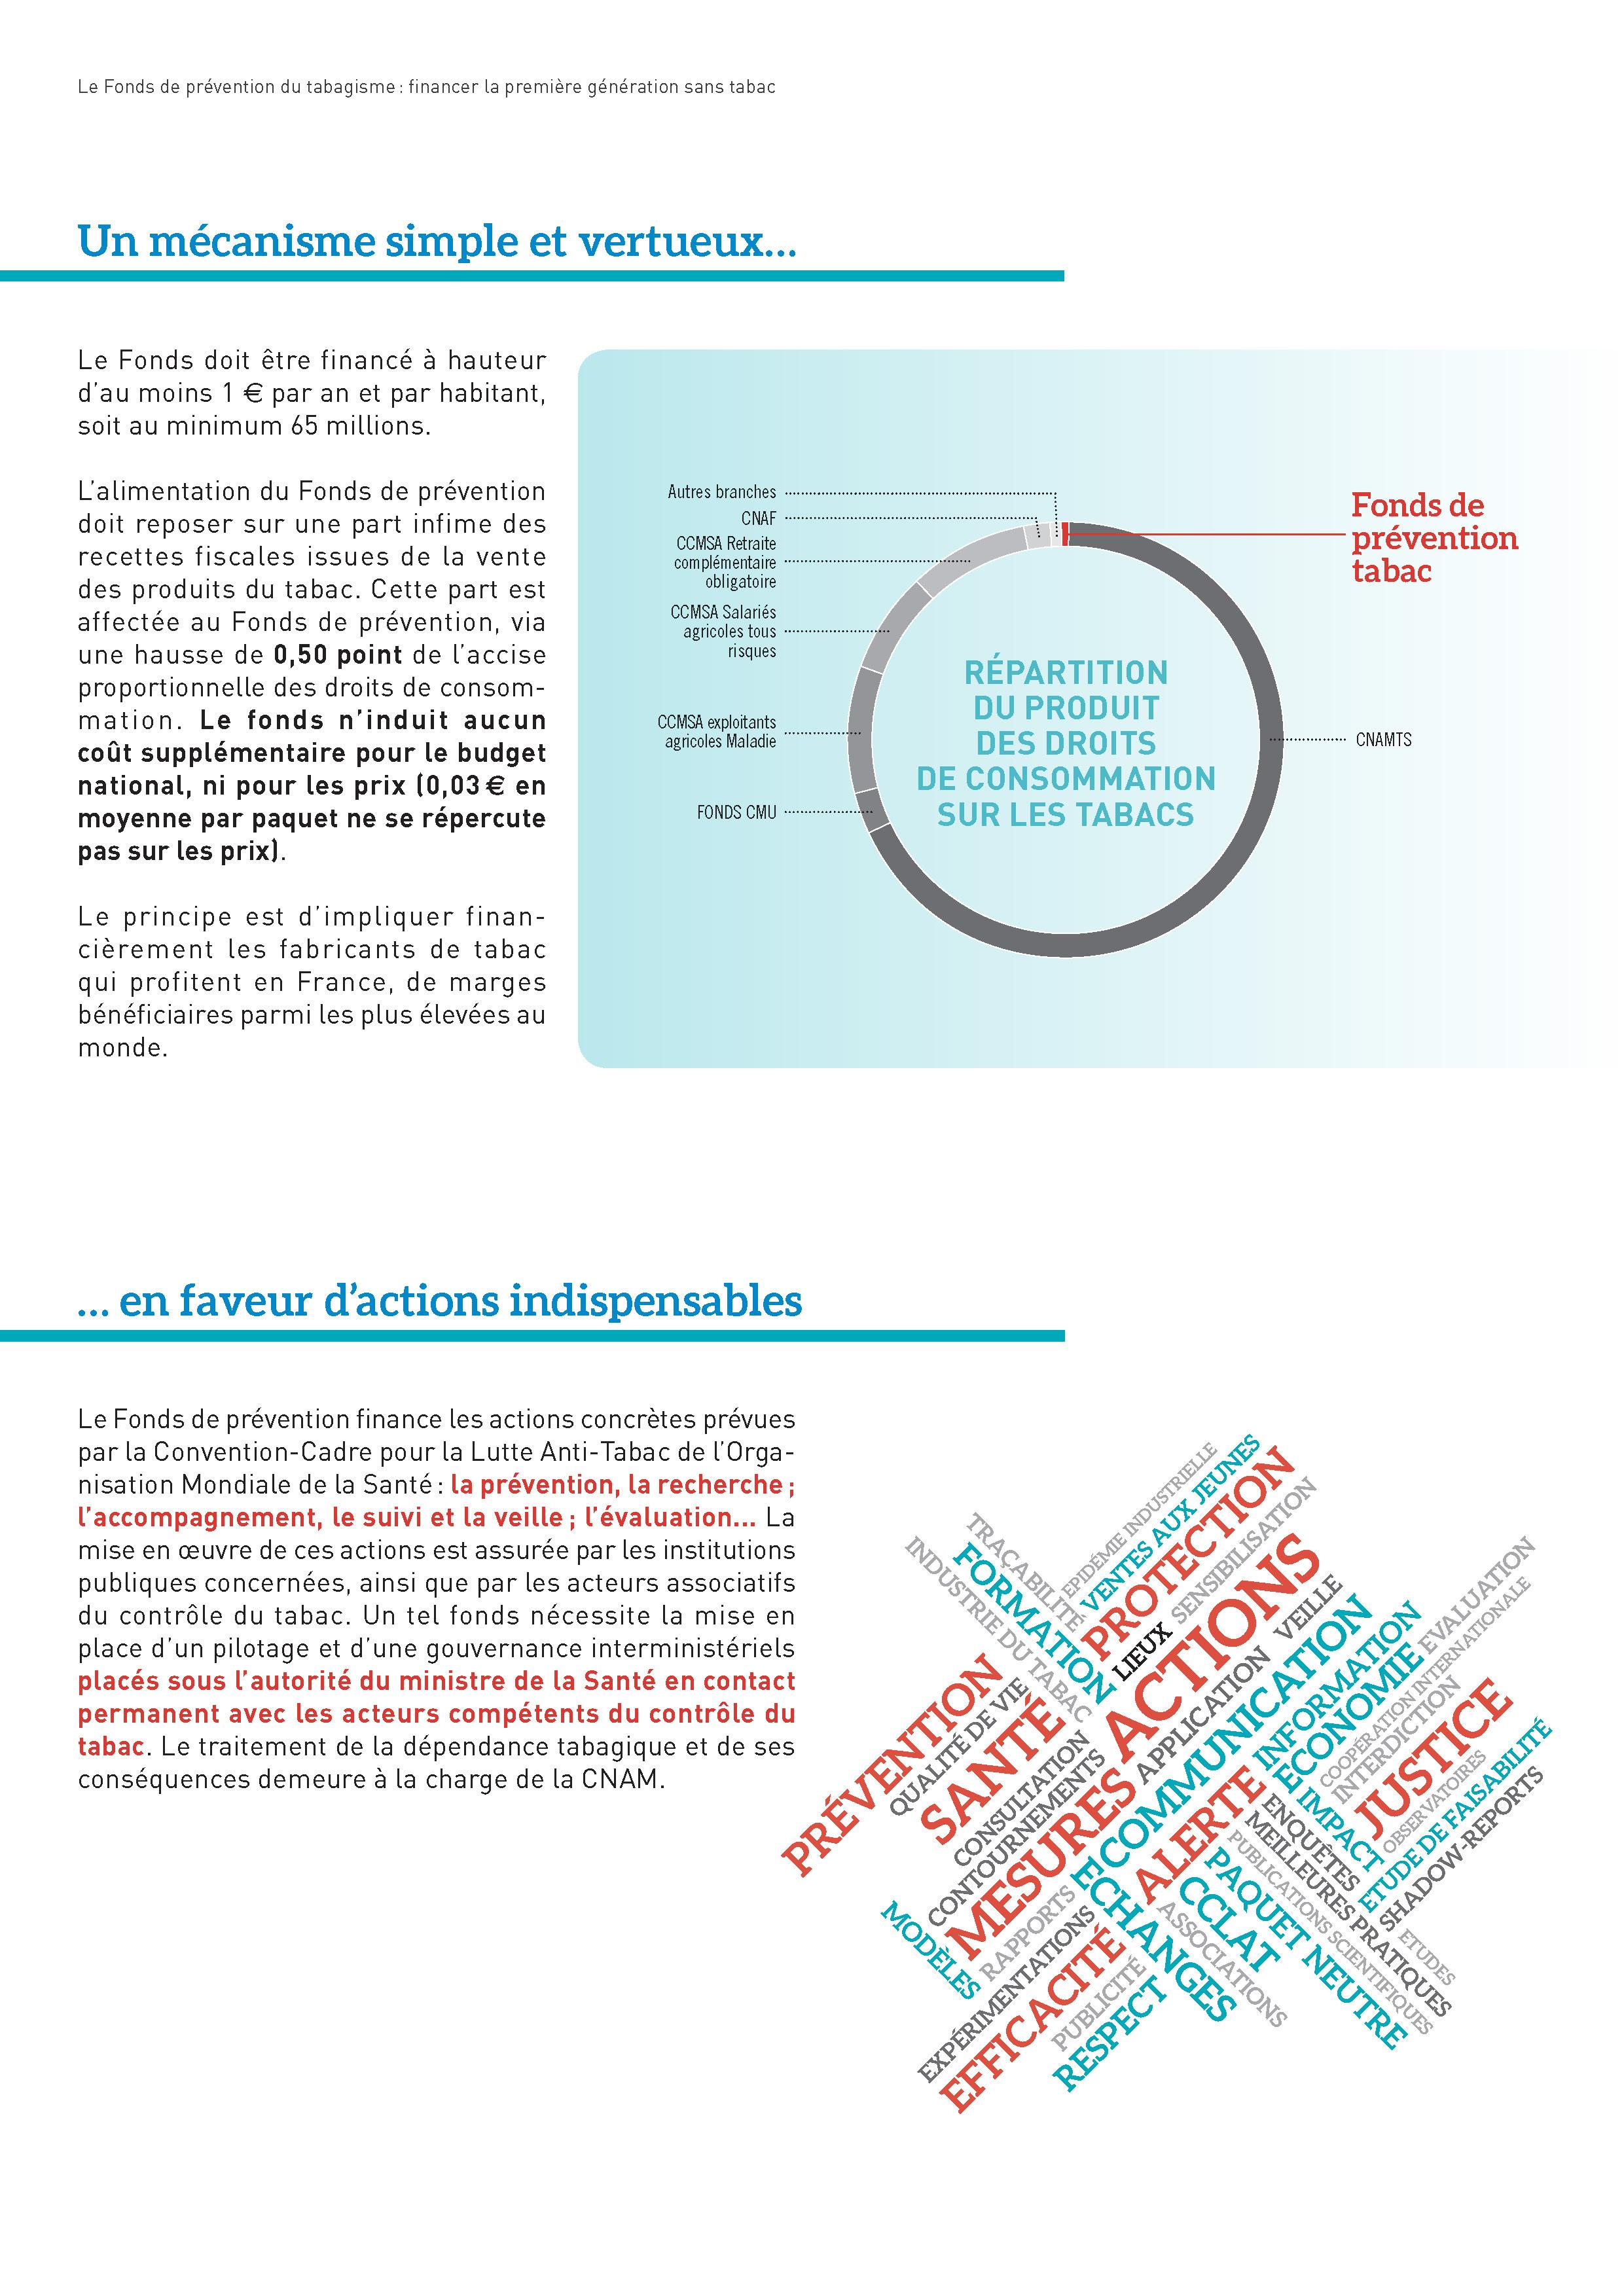 Alliance-DP_journee-mondiale-sans-tabac-avec-annexes-vf-30mai2016_Page_20.jpg